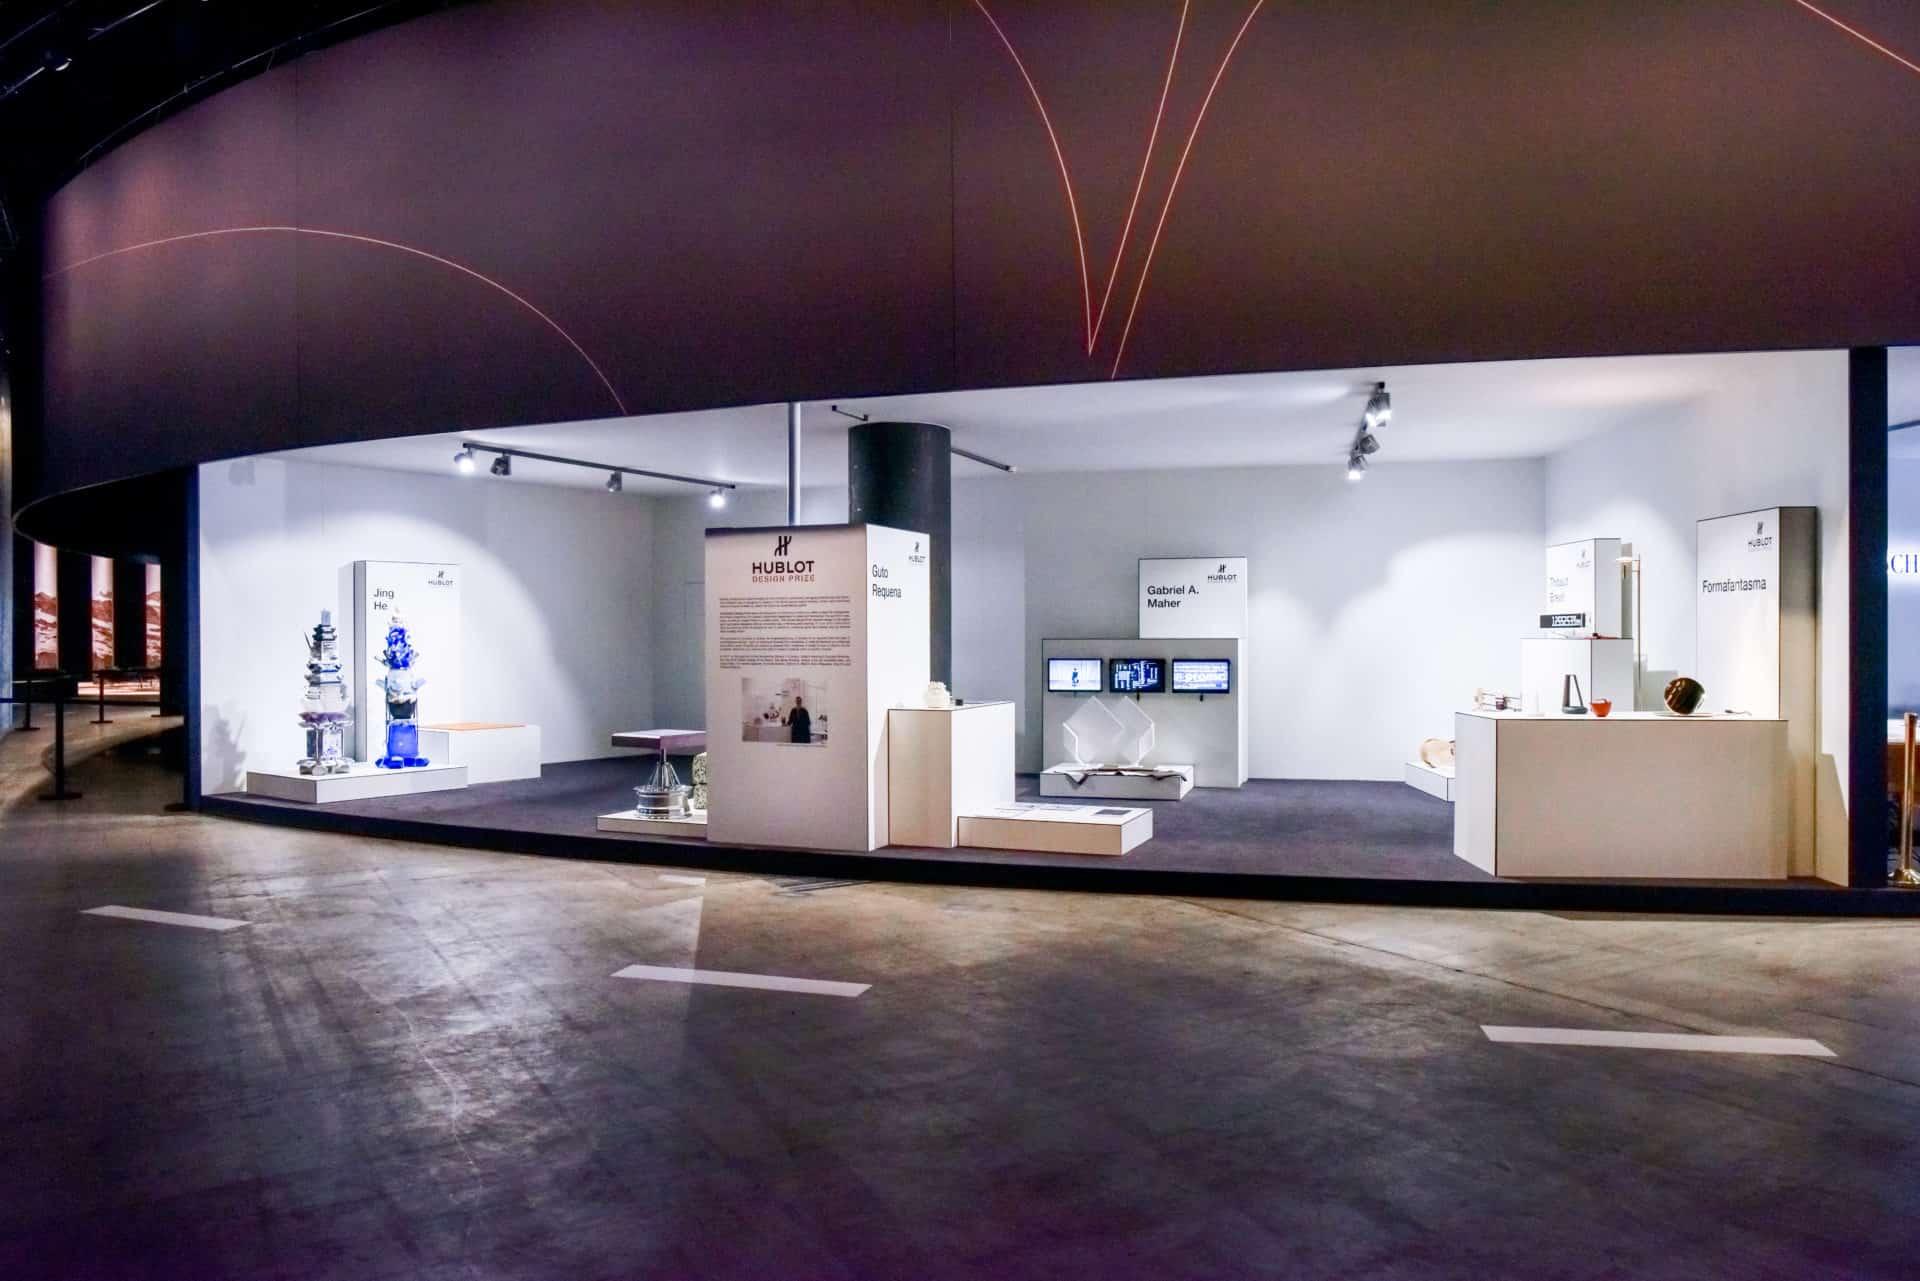 Hublot Design Prize 2018 Ausstellung 2